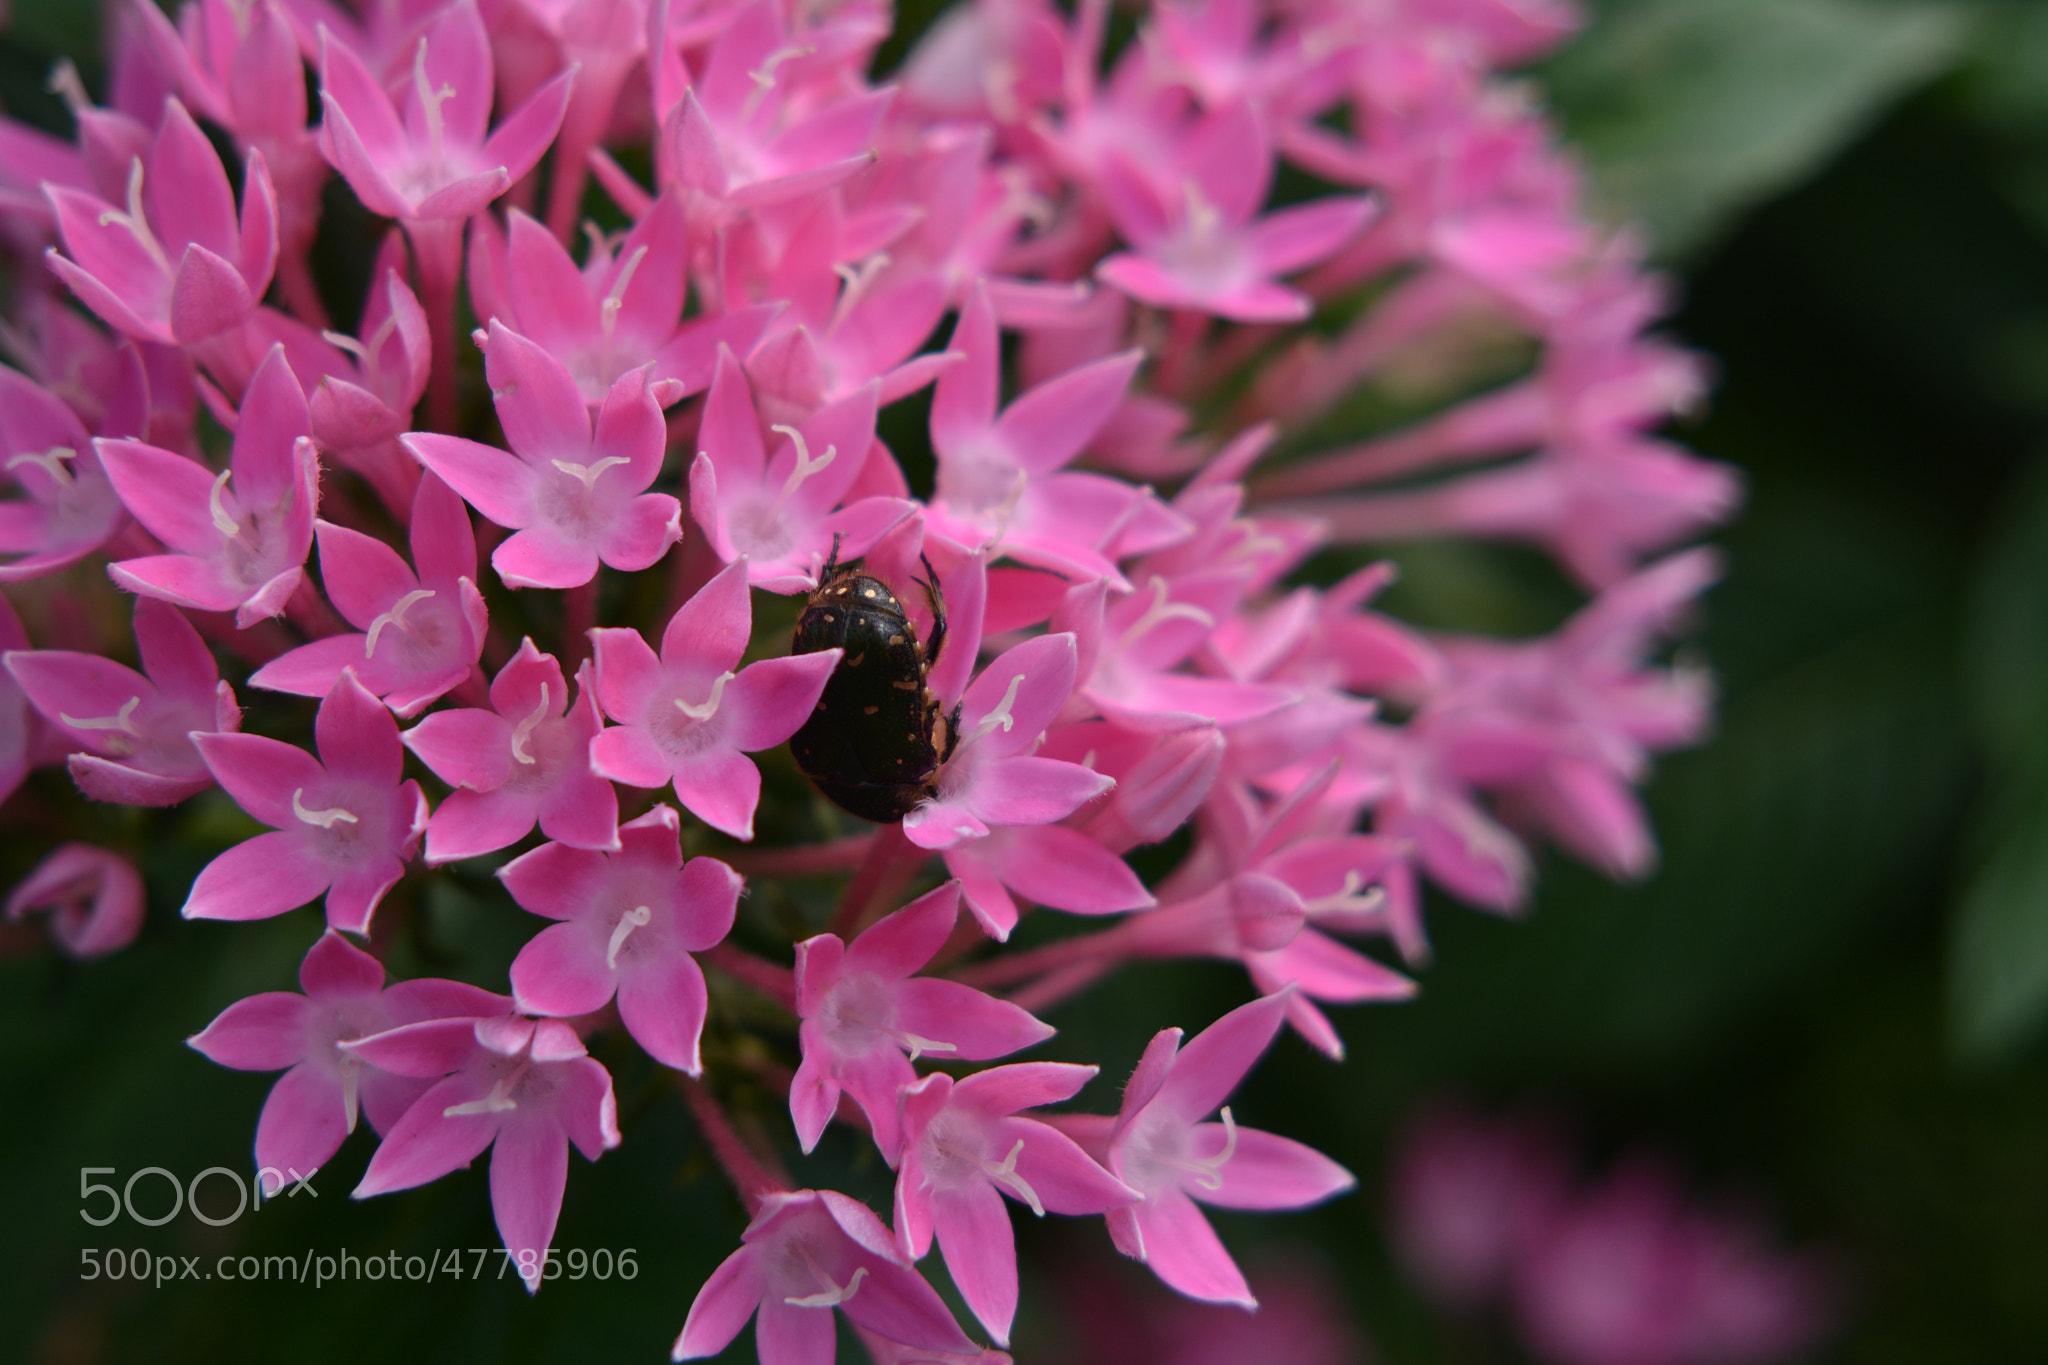 Photograph Ladybug by Eng Yap on 500px